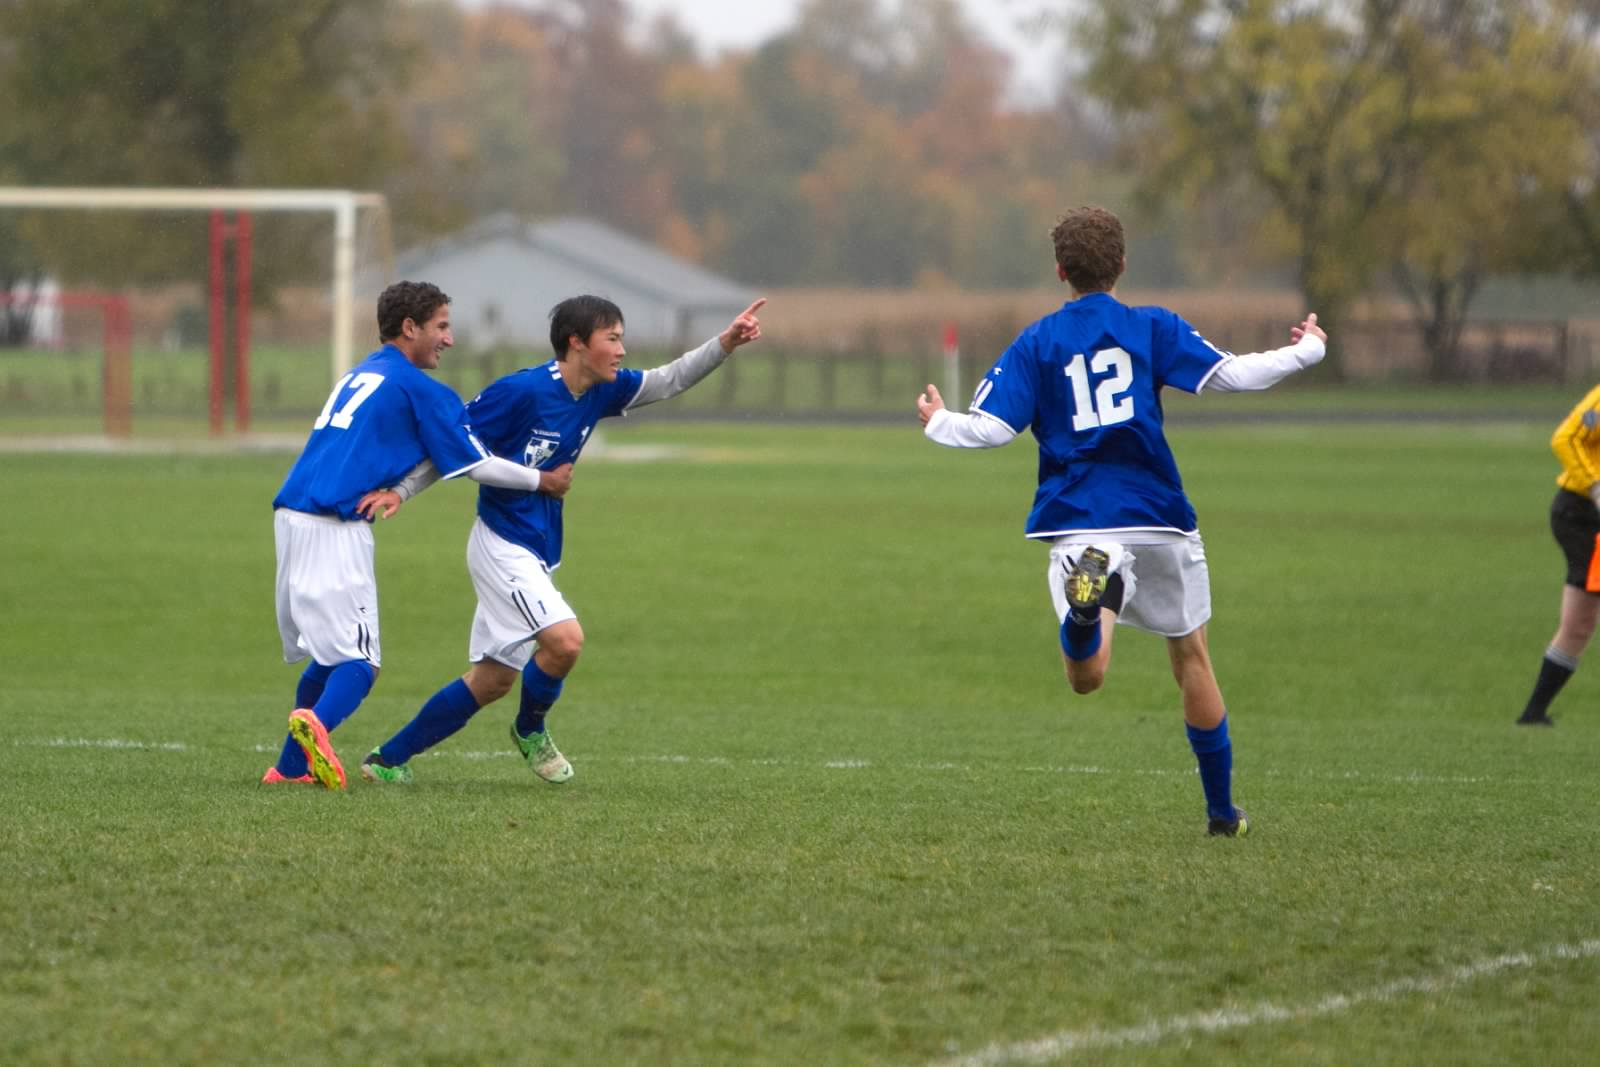 2014-boys-soccer-regional-1415280997.jpg